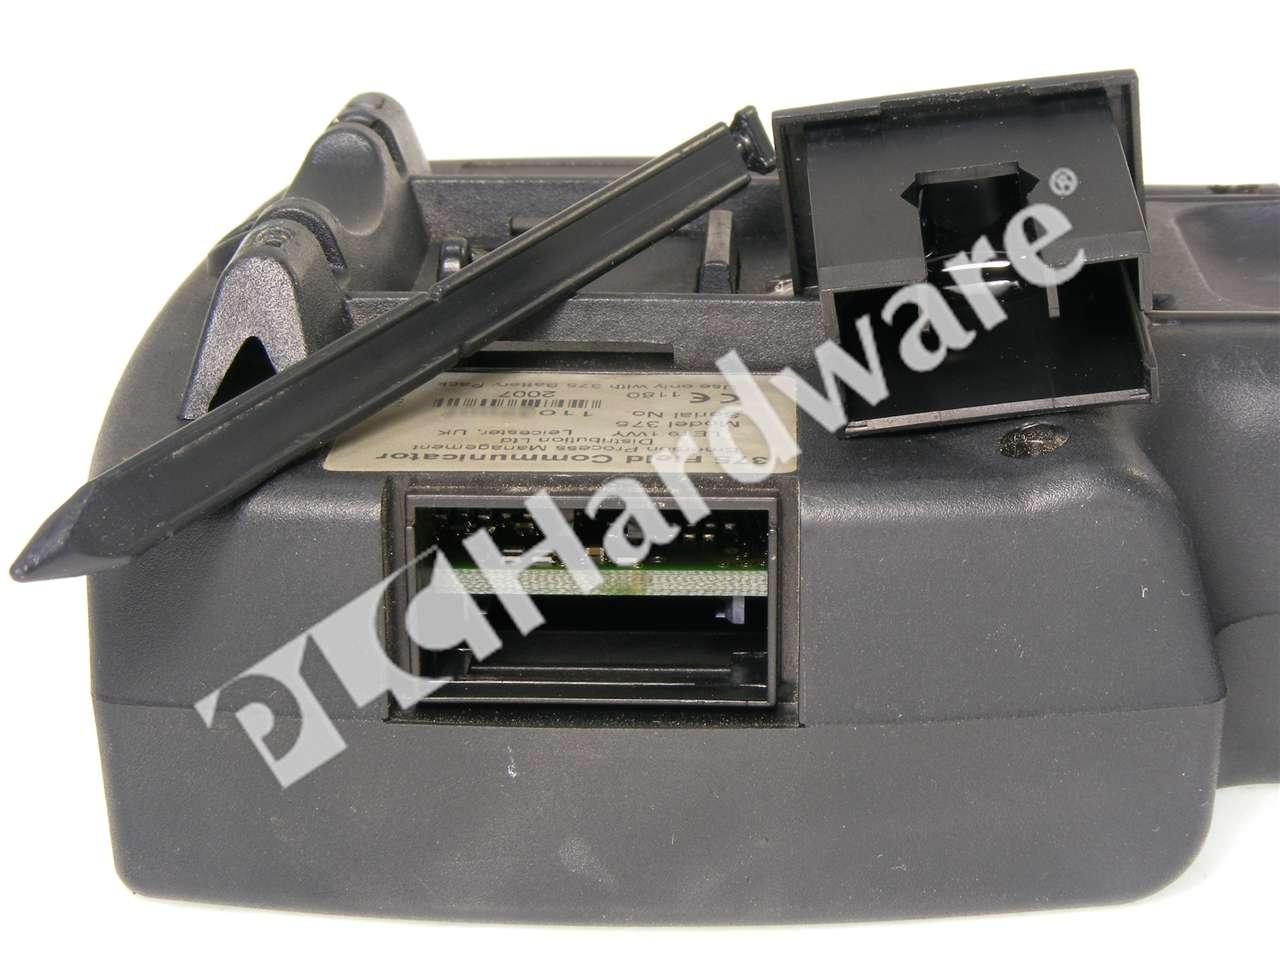 hart communicator 375 user manual pdf